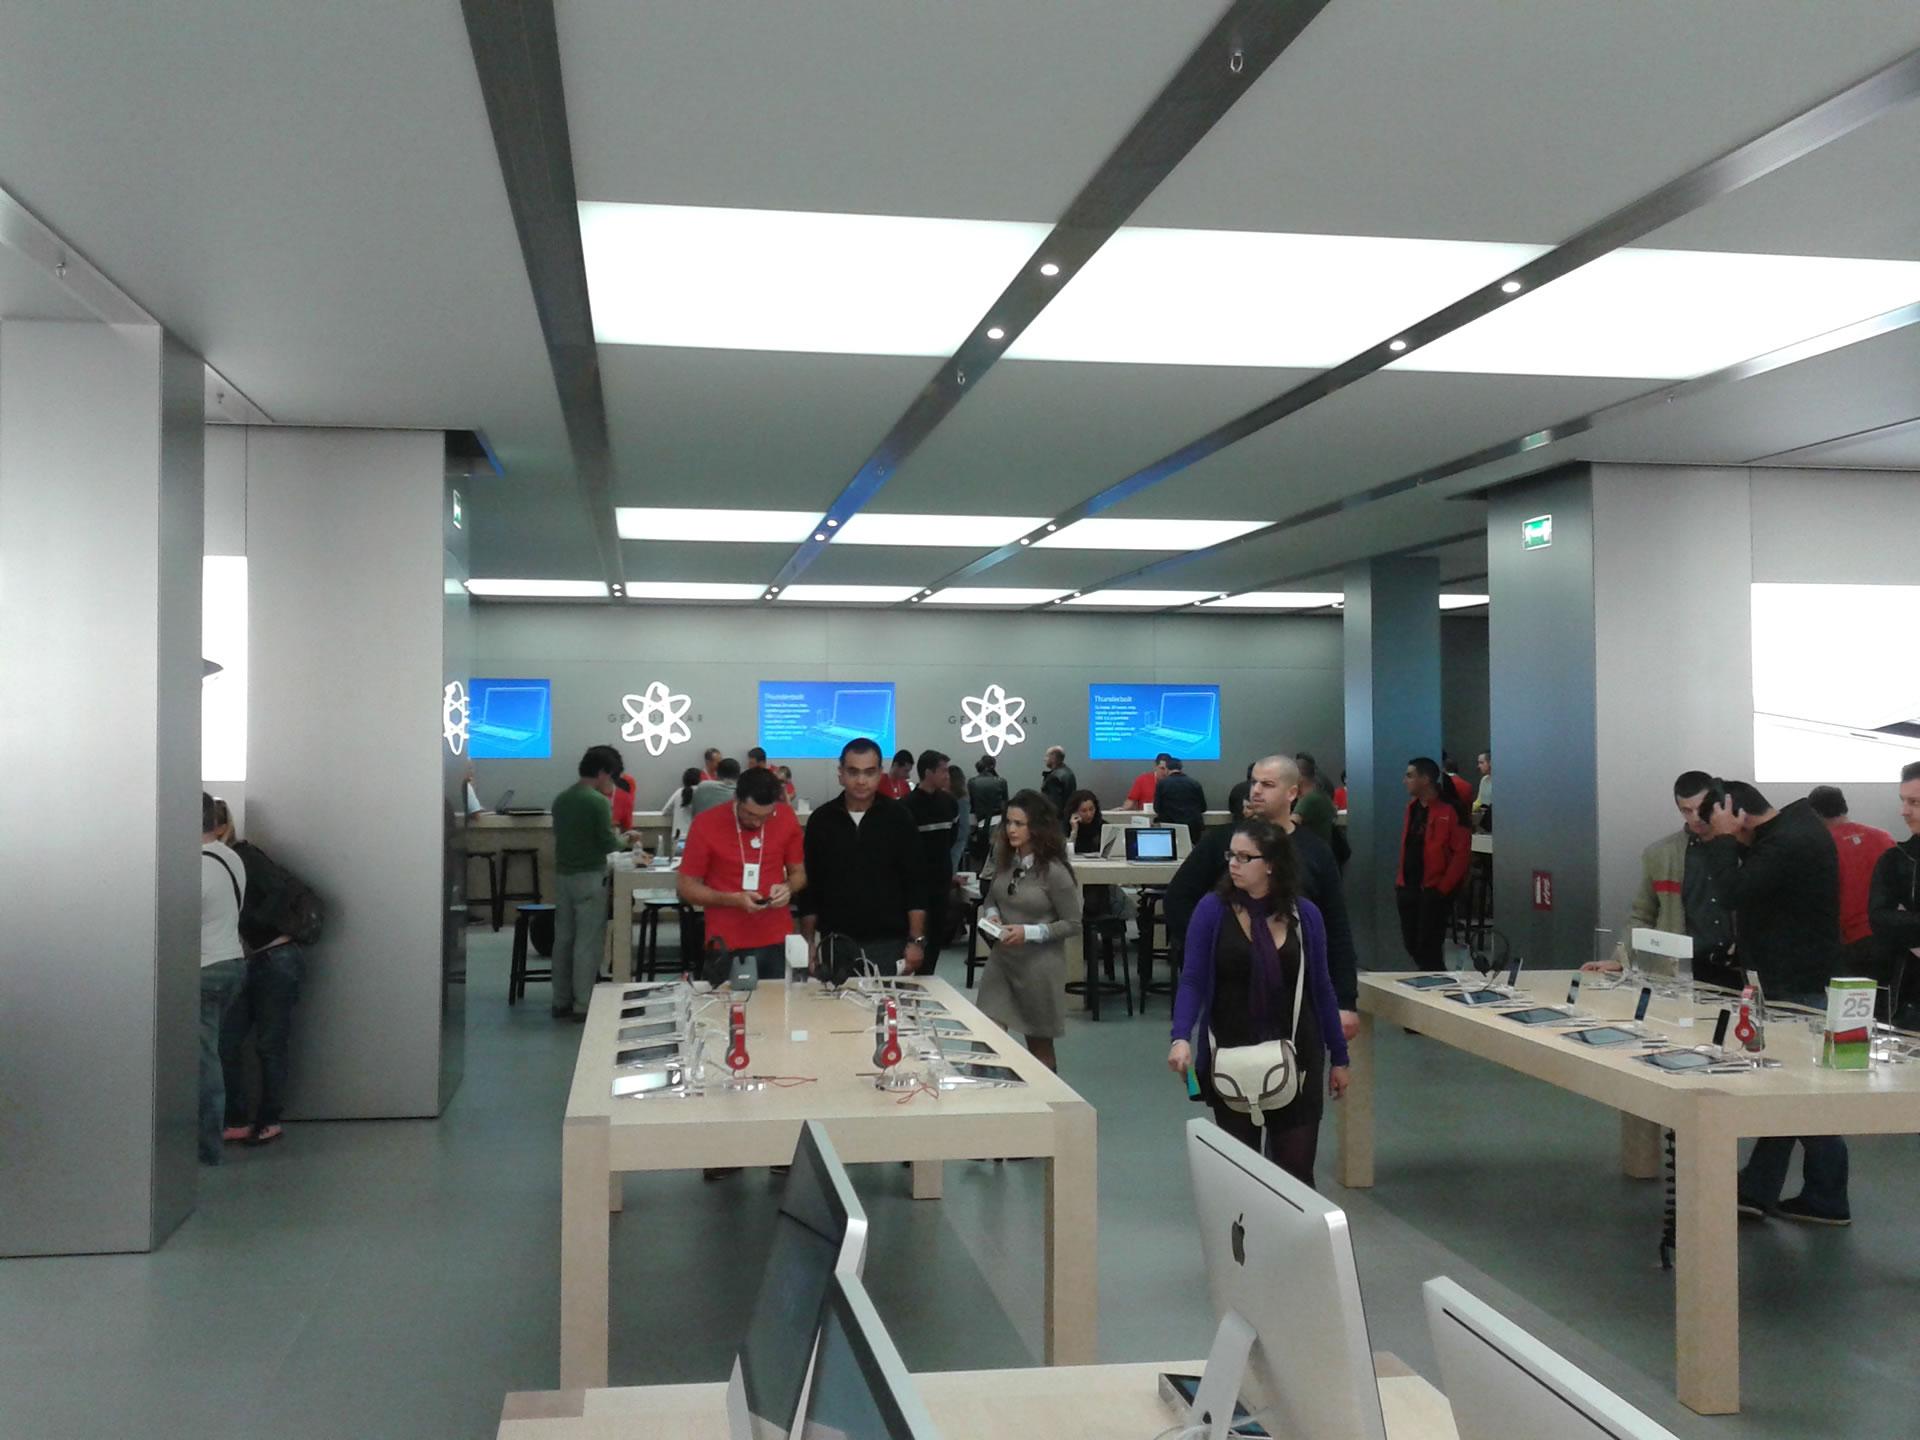 Apple Store Marbella opened